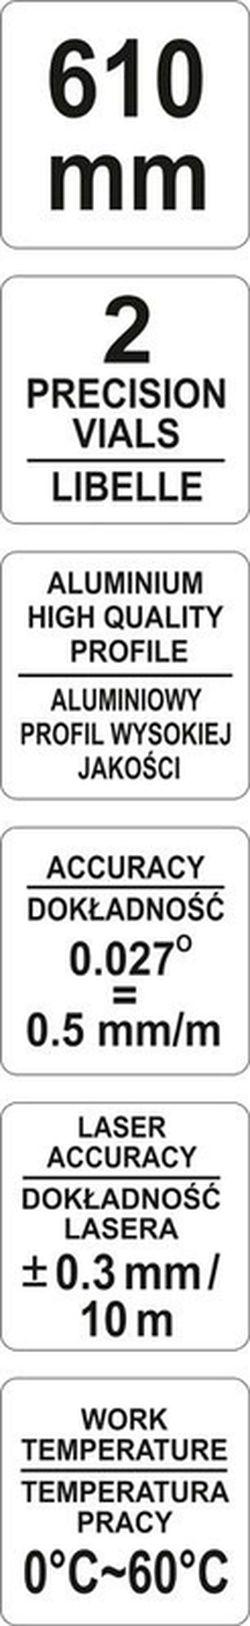 Уклономер Yato YT-30400